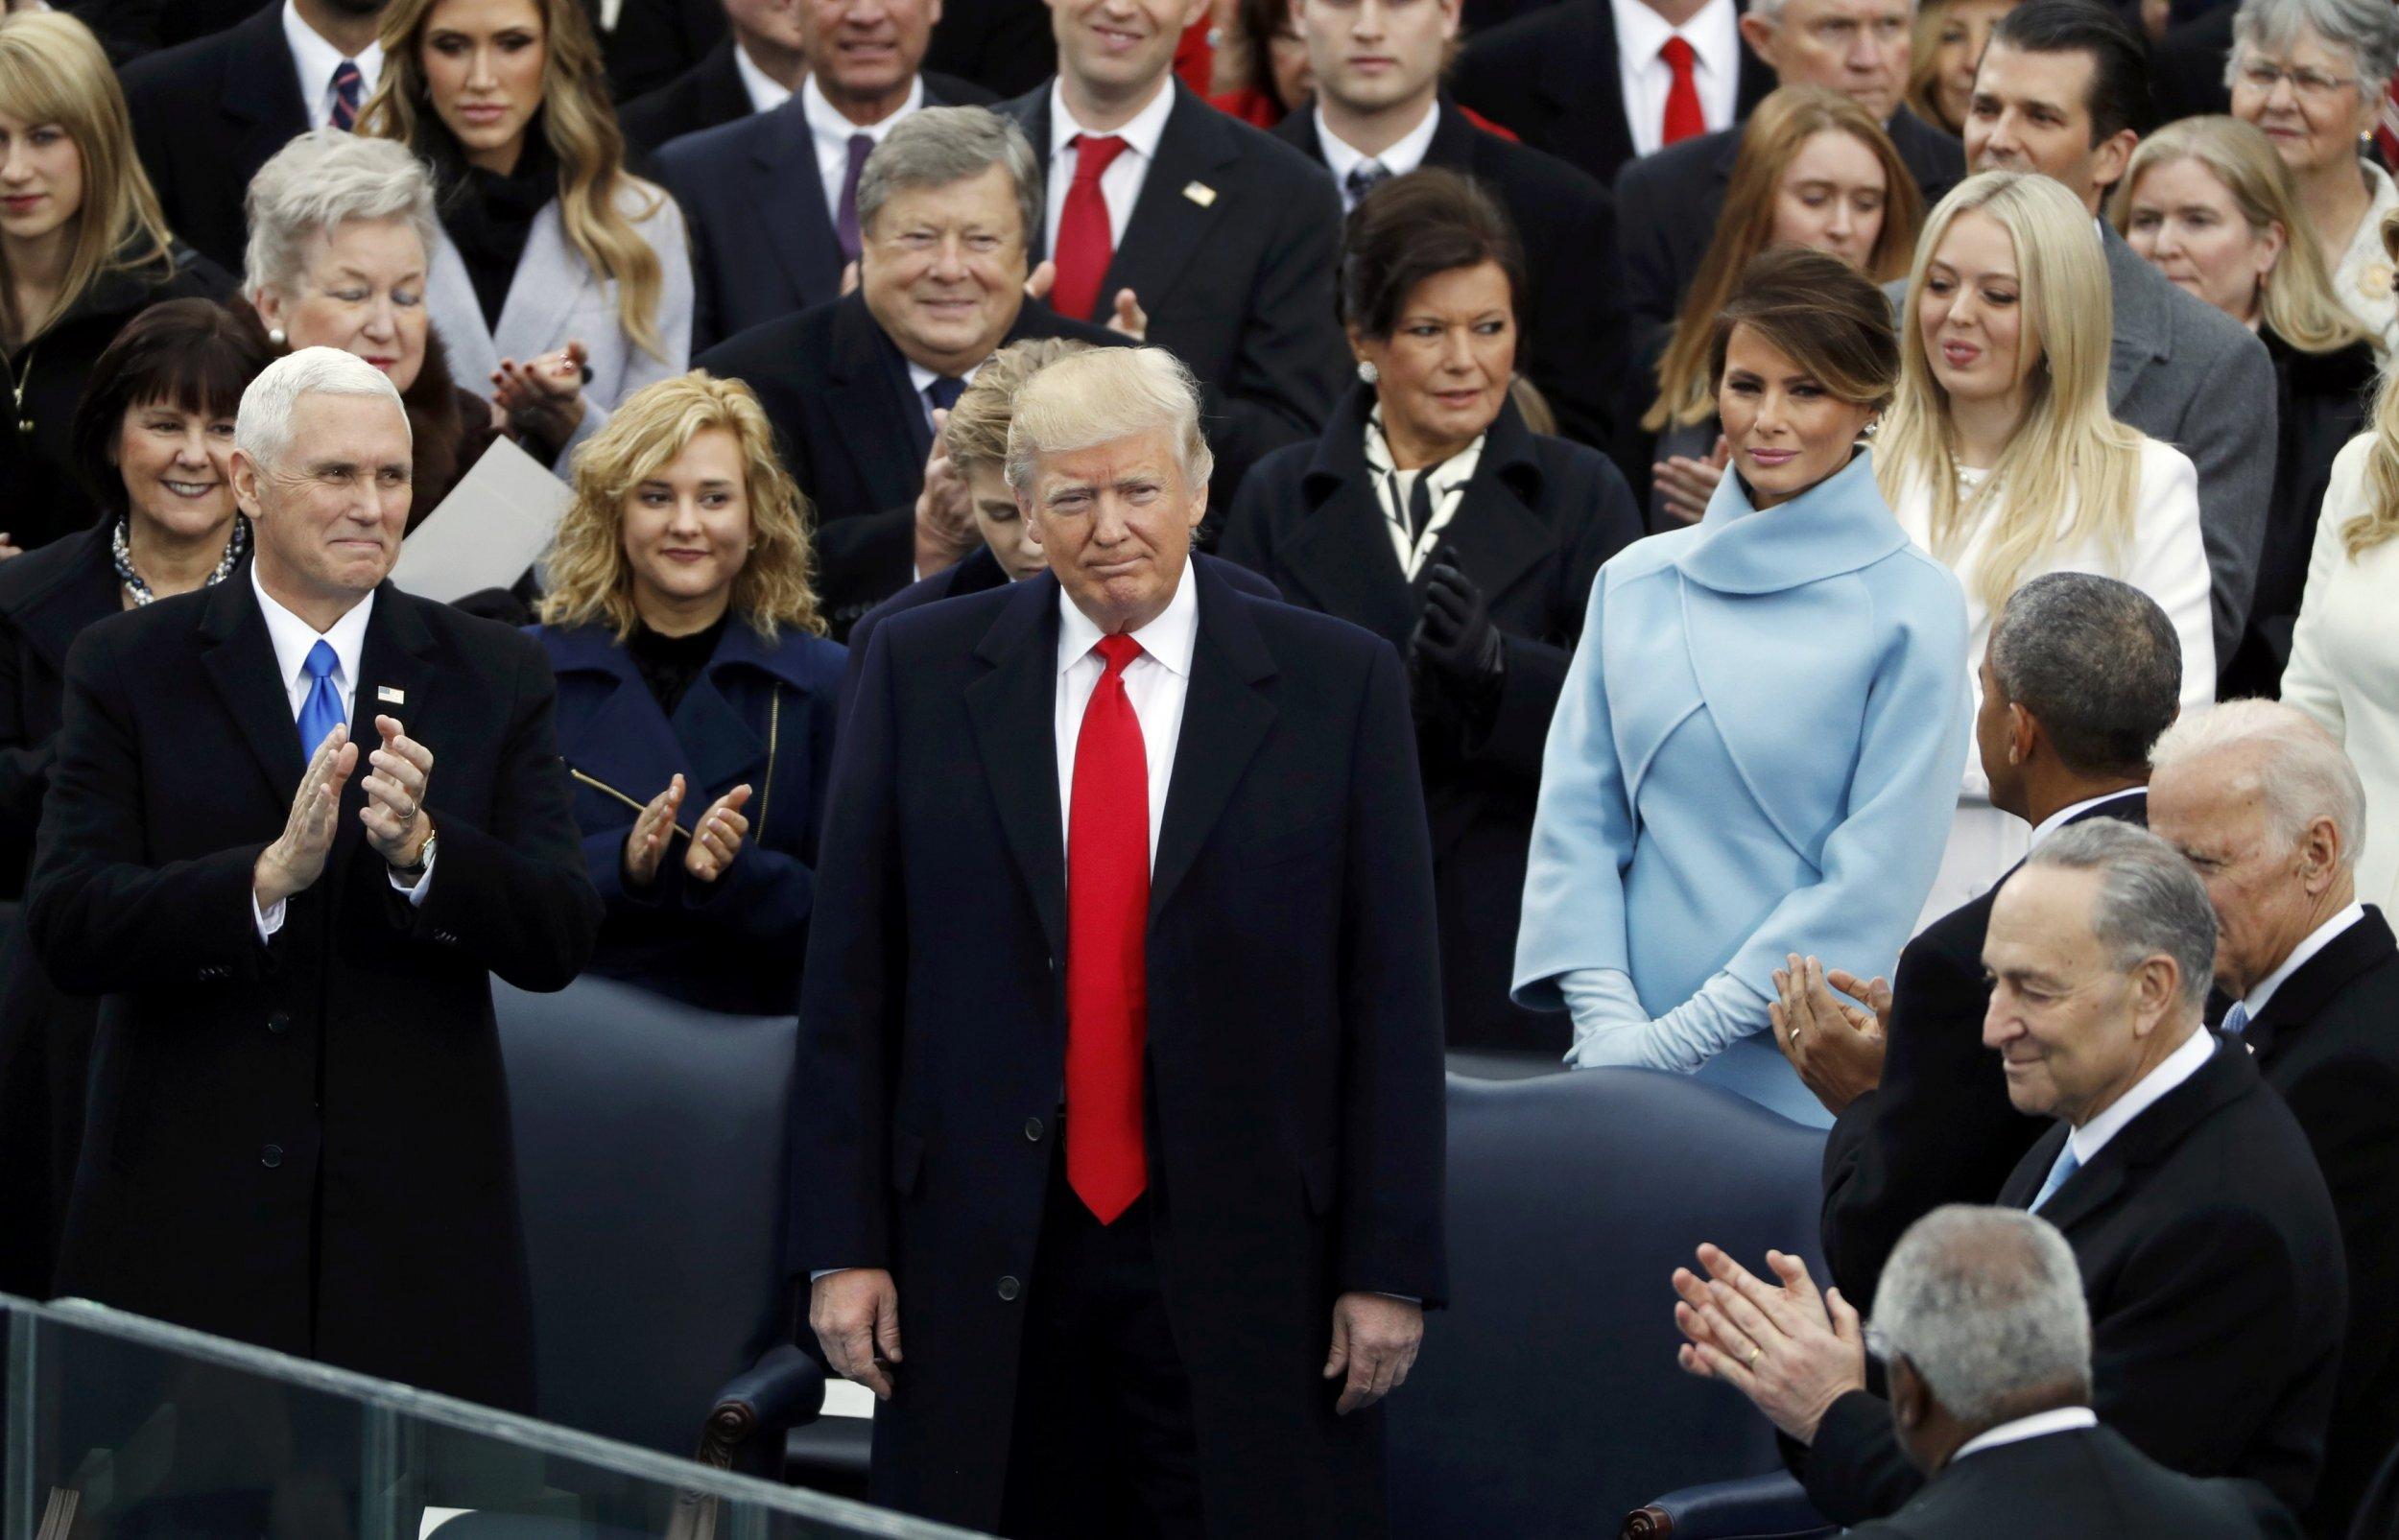 trump_inauguration_speech_0120